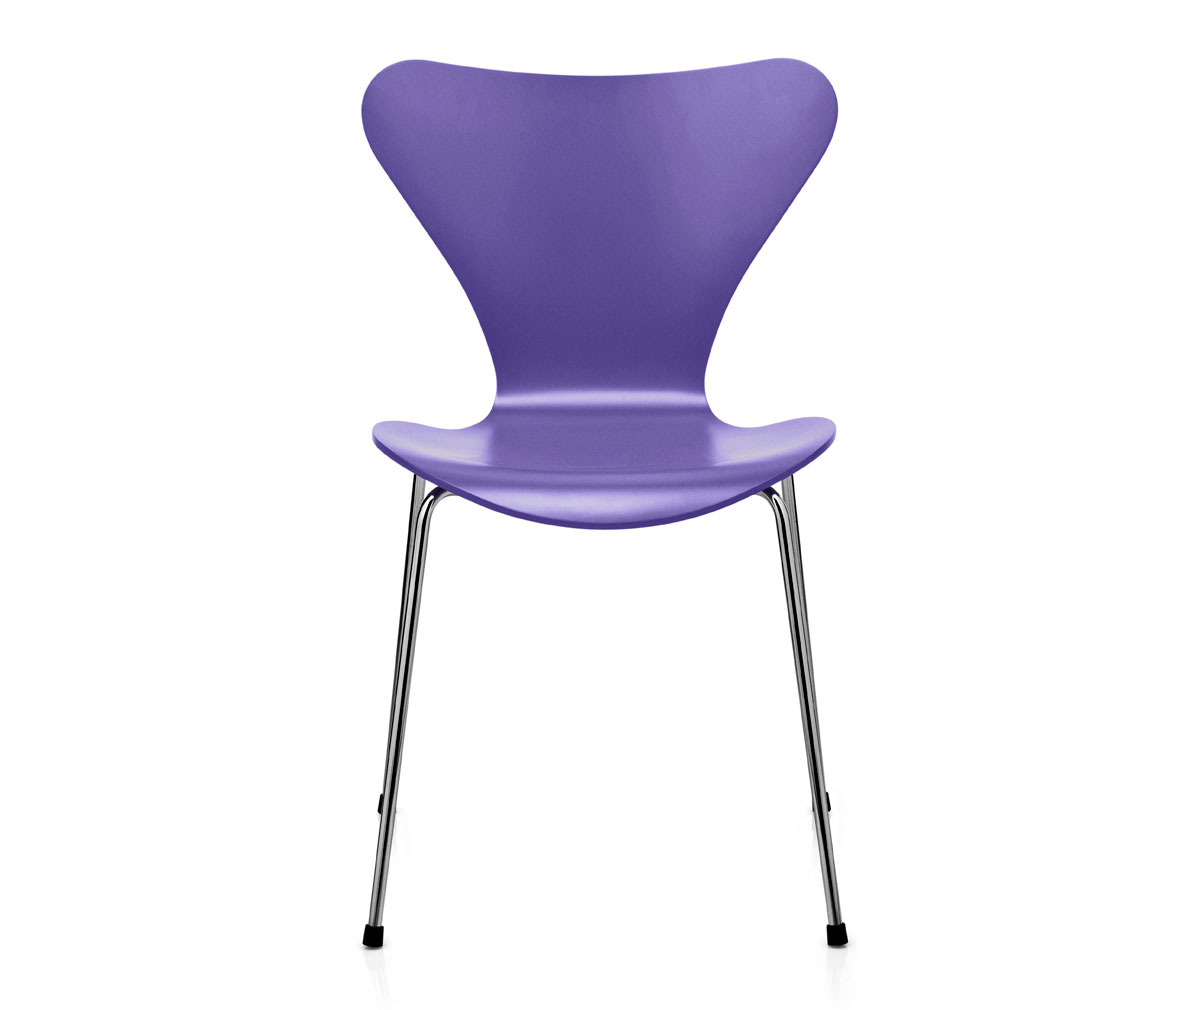 seiska tuoli 3107 peittomaalattu violetti kromi veps l inen. Black Bedroom Furniture Sets. Home Design Ideas